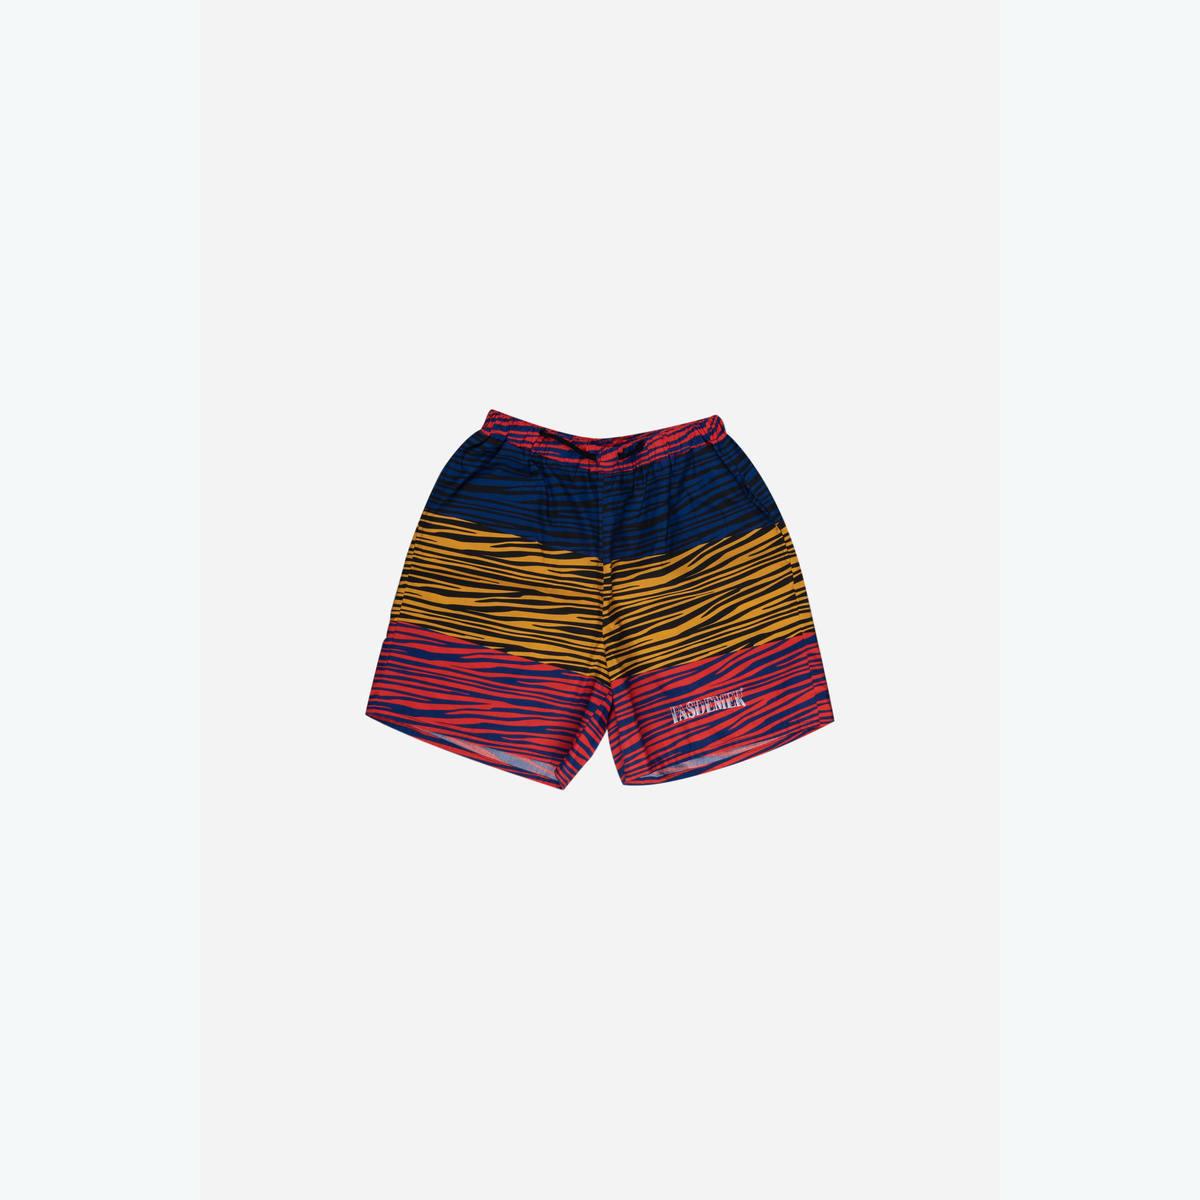 tiger_shorts_pattern_front_risultatotiger_shorts_pattern_front.jpg_risultatotiger_shorts_pattern_front_risultatotiger_shorts_pattern_